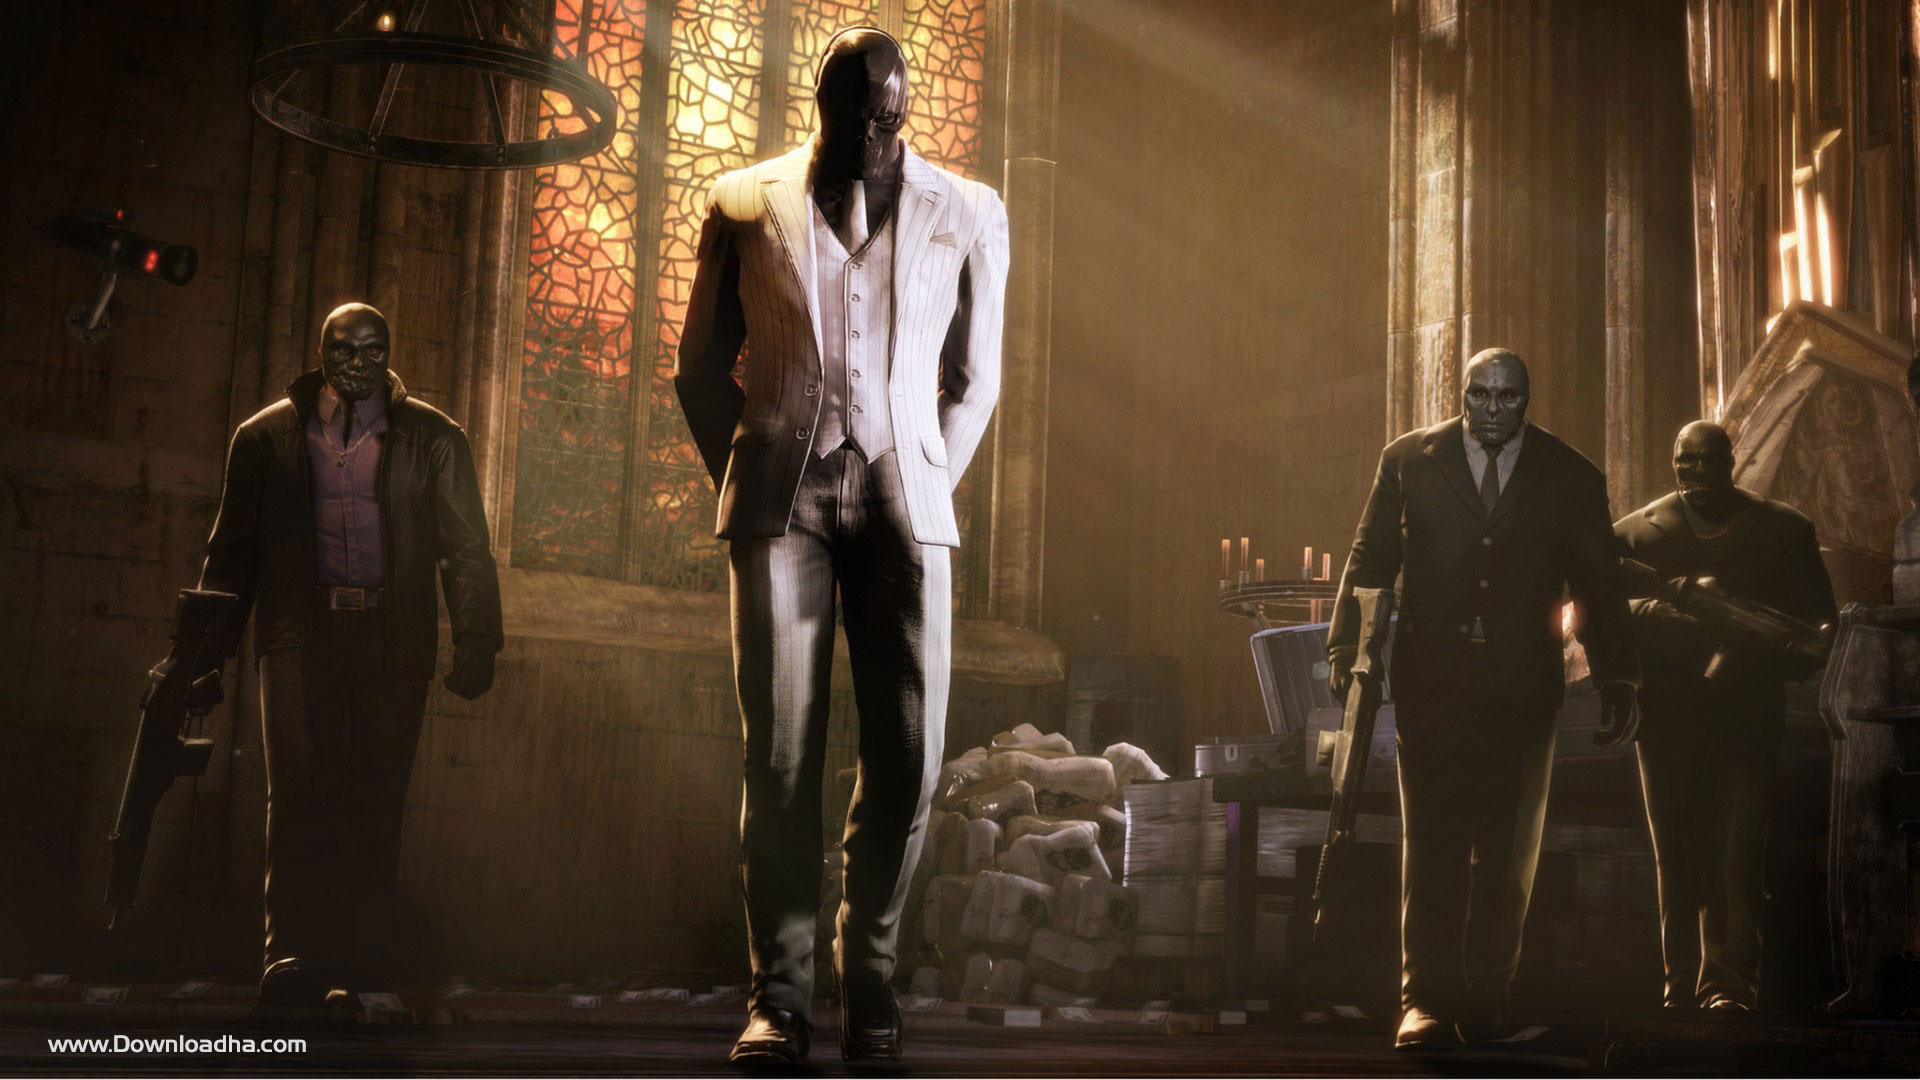 http://img5.downloadha.com/hosein/Game/PS3/Batman%20Arkham%20Origins/Batman-Arkham-Origins-screenshots-05-large.jpg